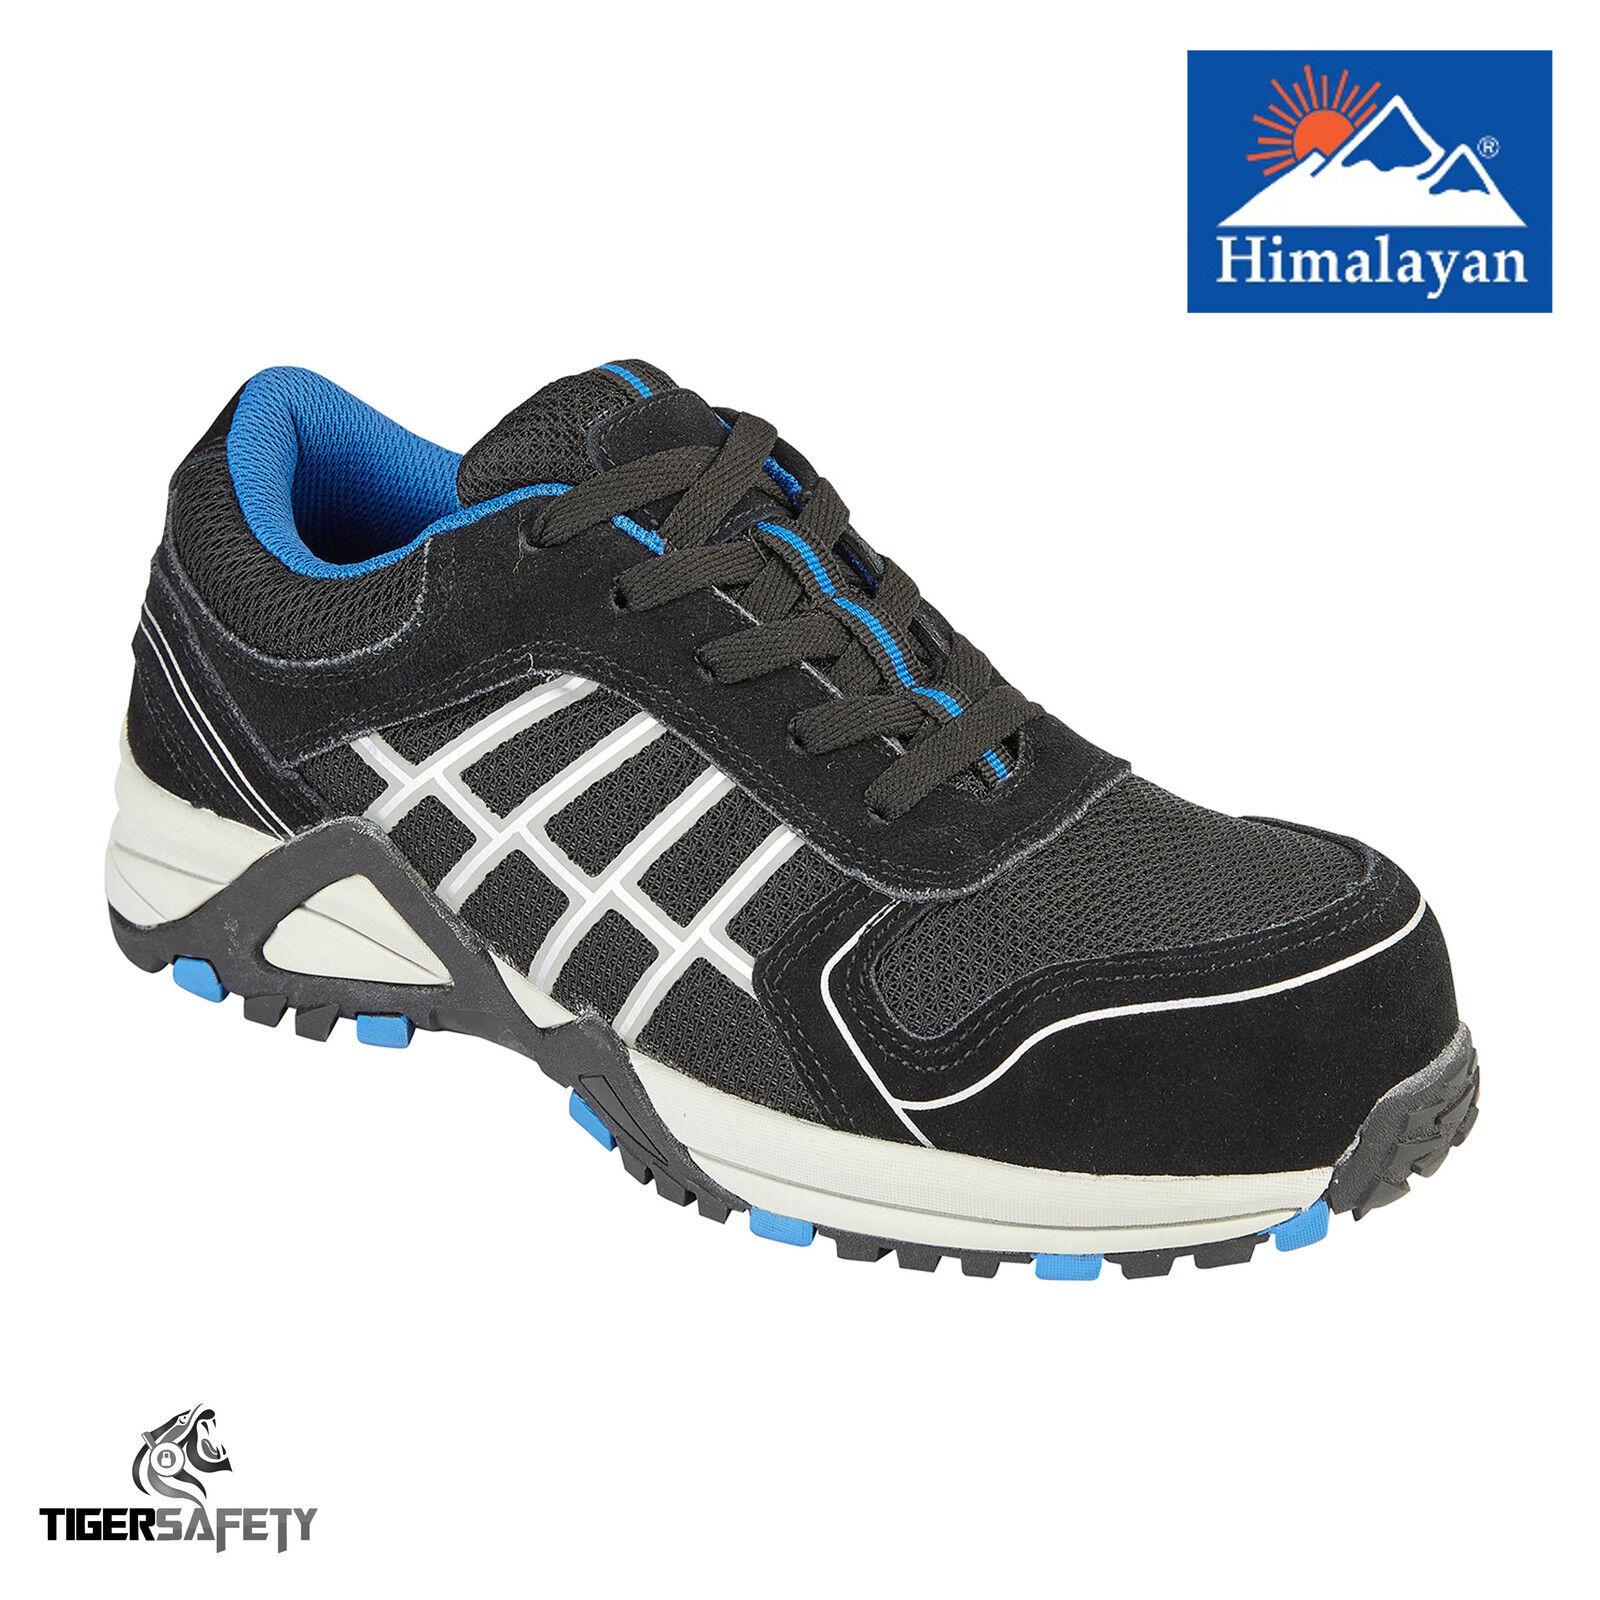 3421 dell'Himalaya S1P nera in pelle puntale composito metal free SNEAKERS DA